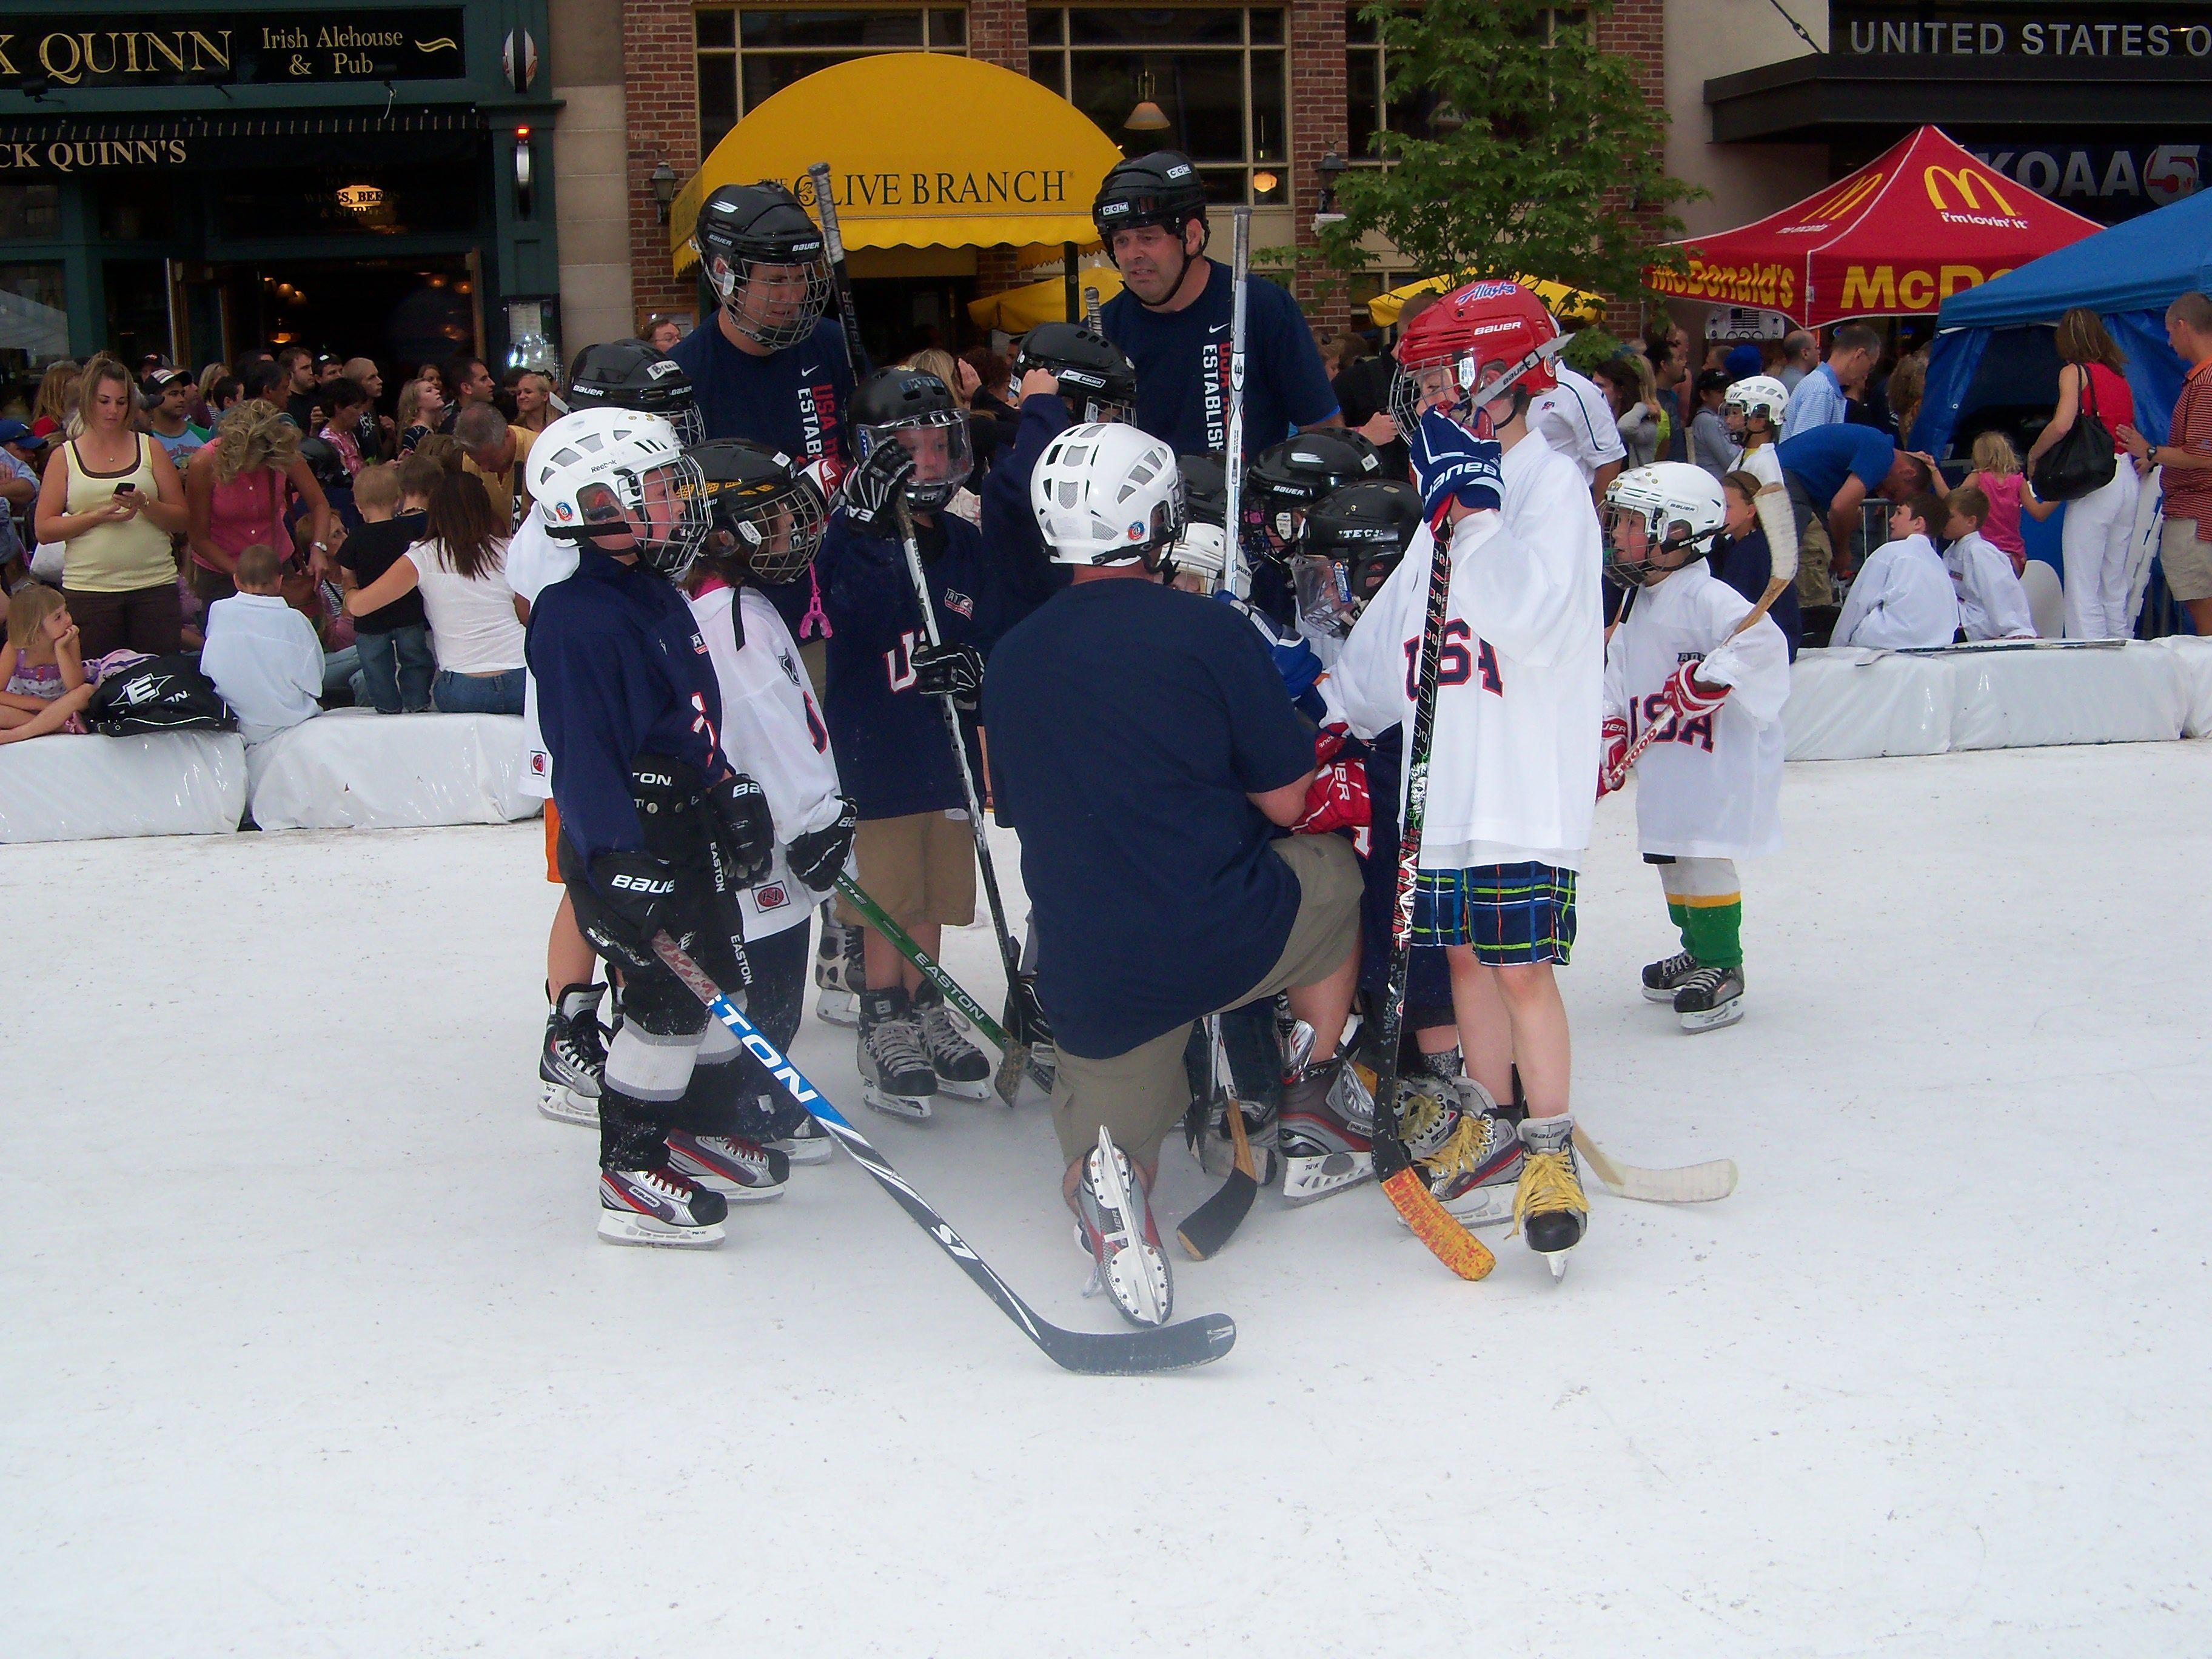 2012 Summer Olympic Celebration In Downtown Colorado Springs Photo Justin Felisko Usa Hockey Magazine 2012 Summer Olympics Usa Hockey Summer Olympics